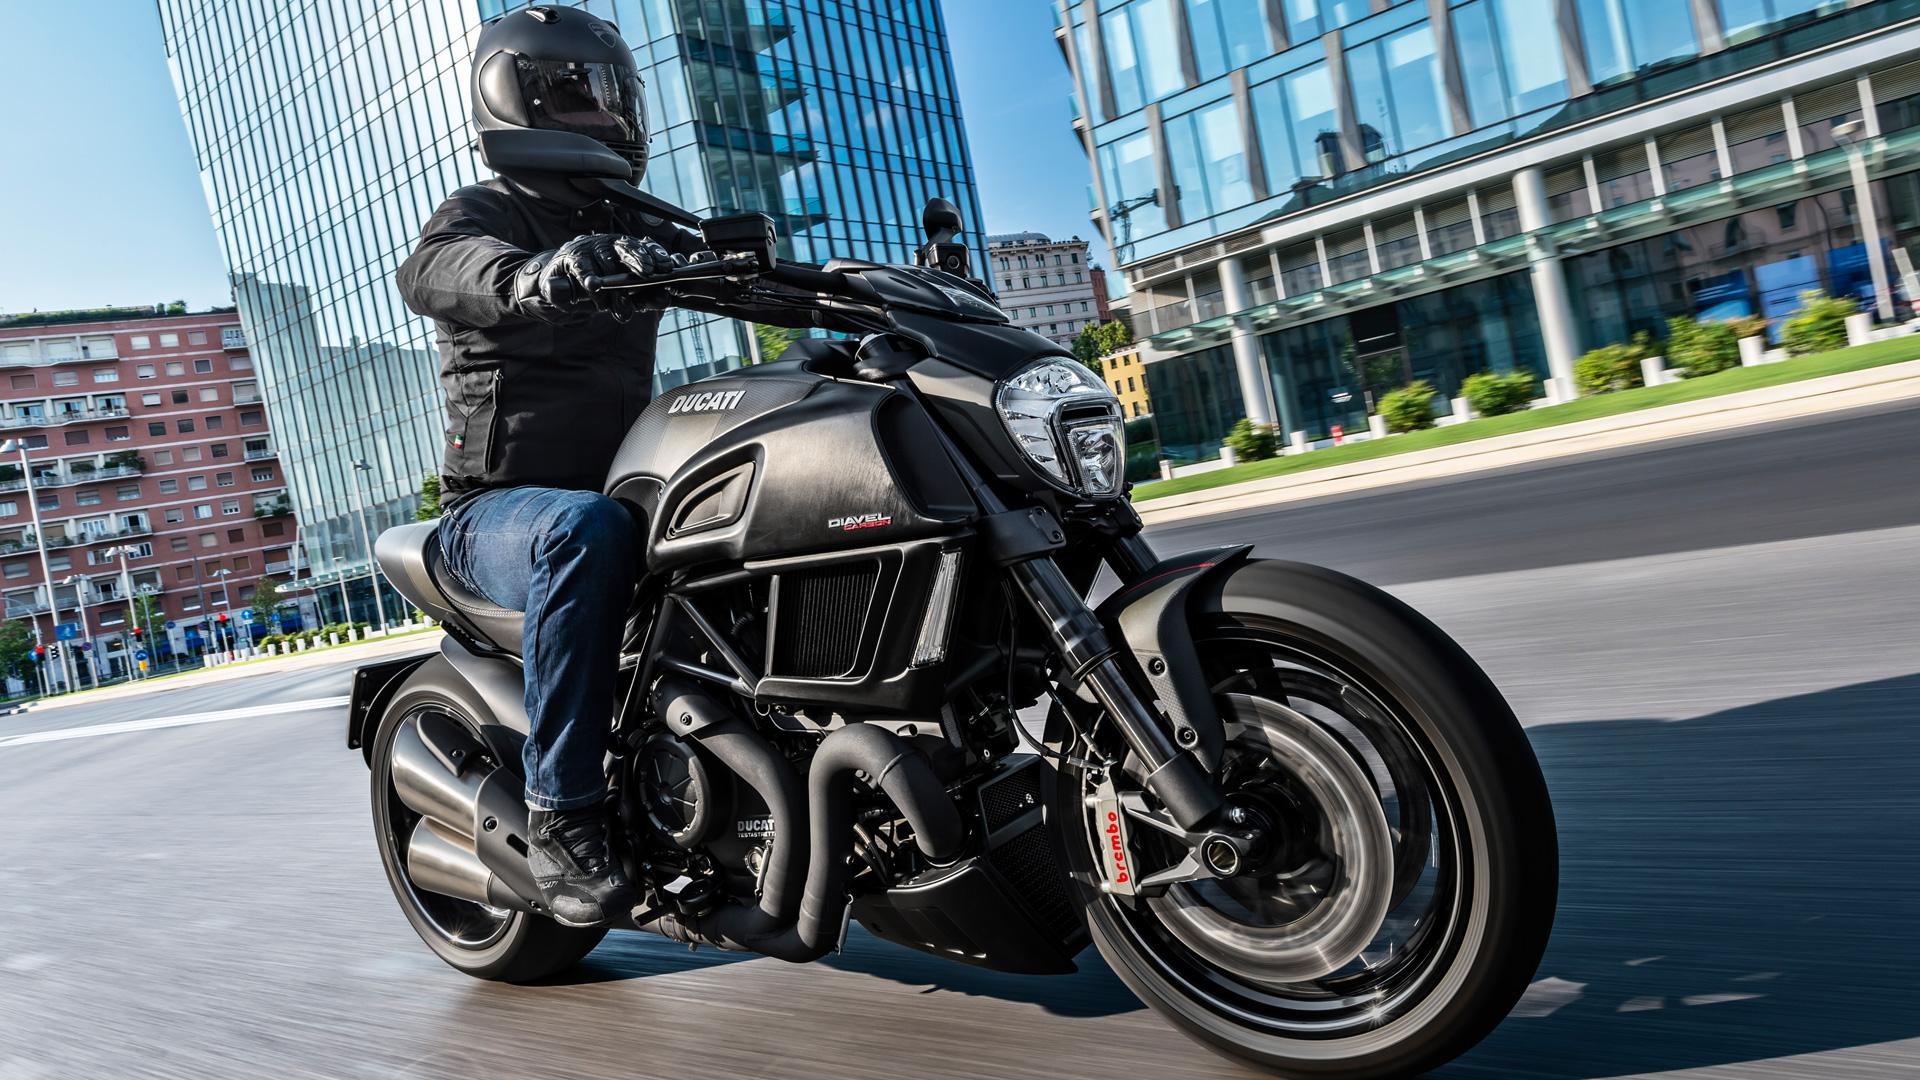 МОТОЦИКЛ DUCATI DIAVEL CARBON 2018 ― Артмото - купить квадроцикл в украине и харькове, мотоцикл, снегоход, скутер, мопед, электромобиль